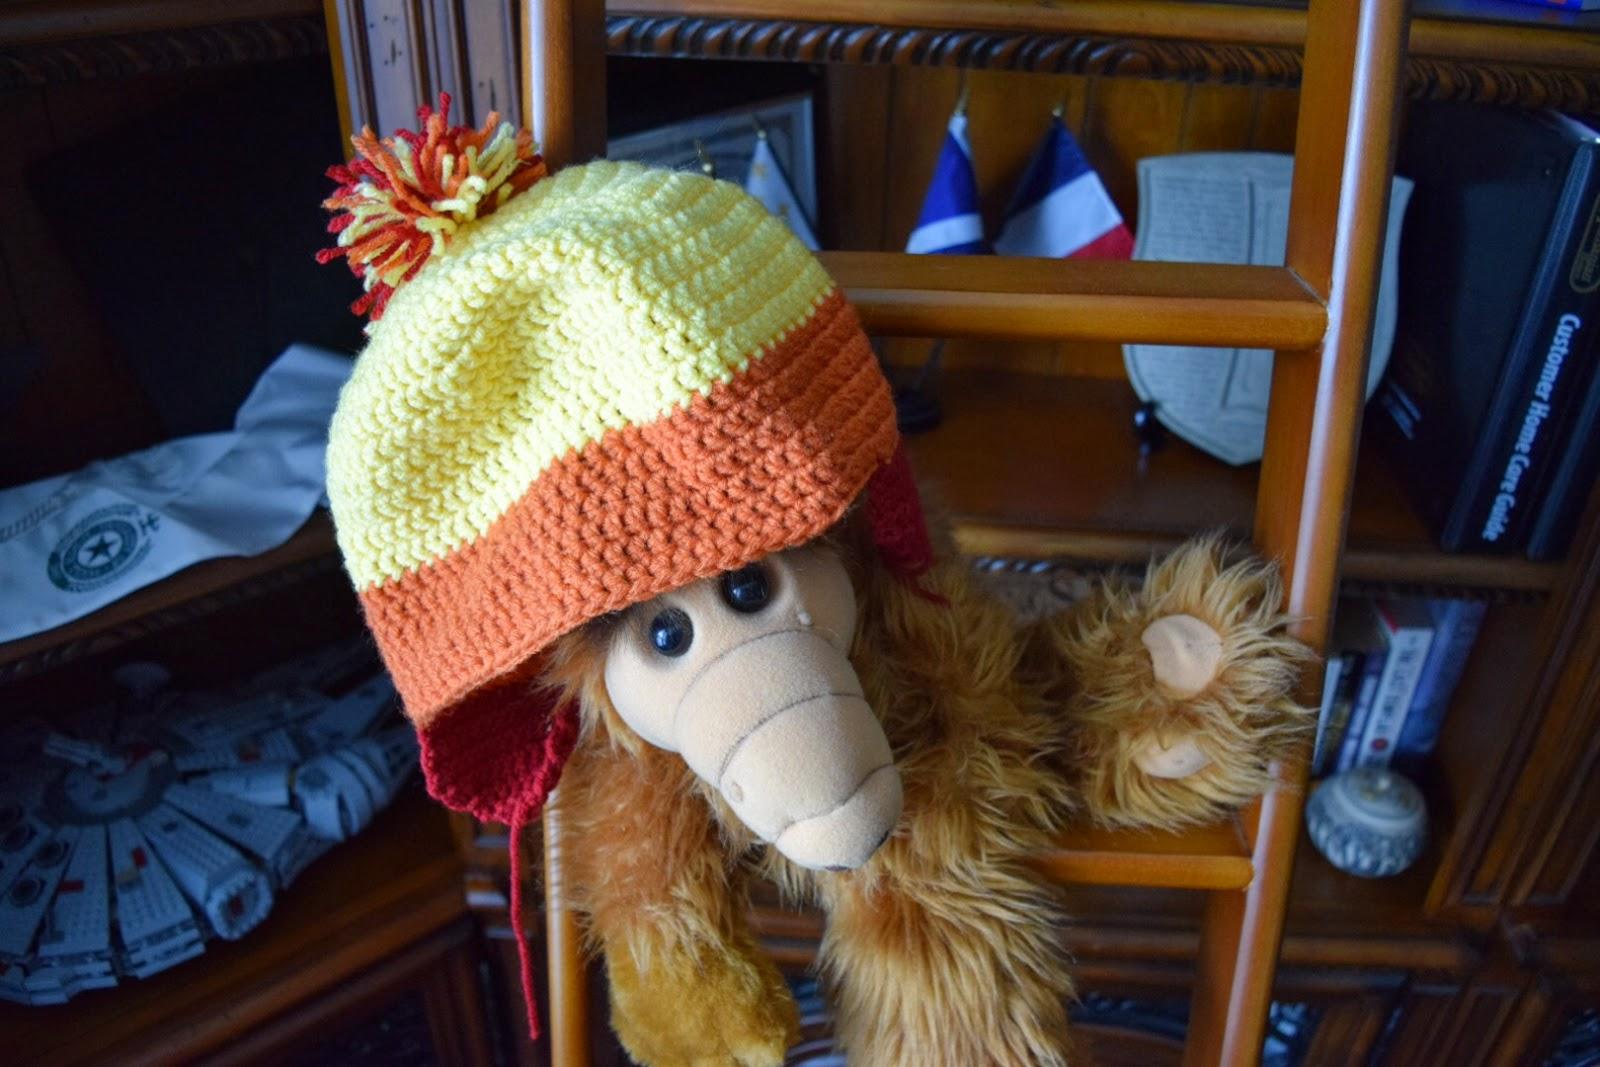 Jayne Cobb Hat Free Crochet Pattern : All Things Chateau de Savoy: Crochet version of Jayne Cobb ...